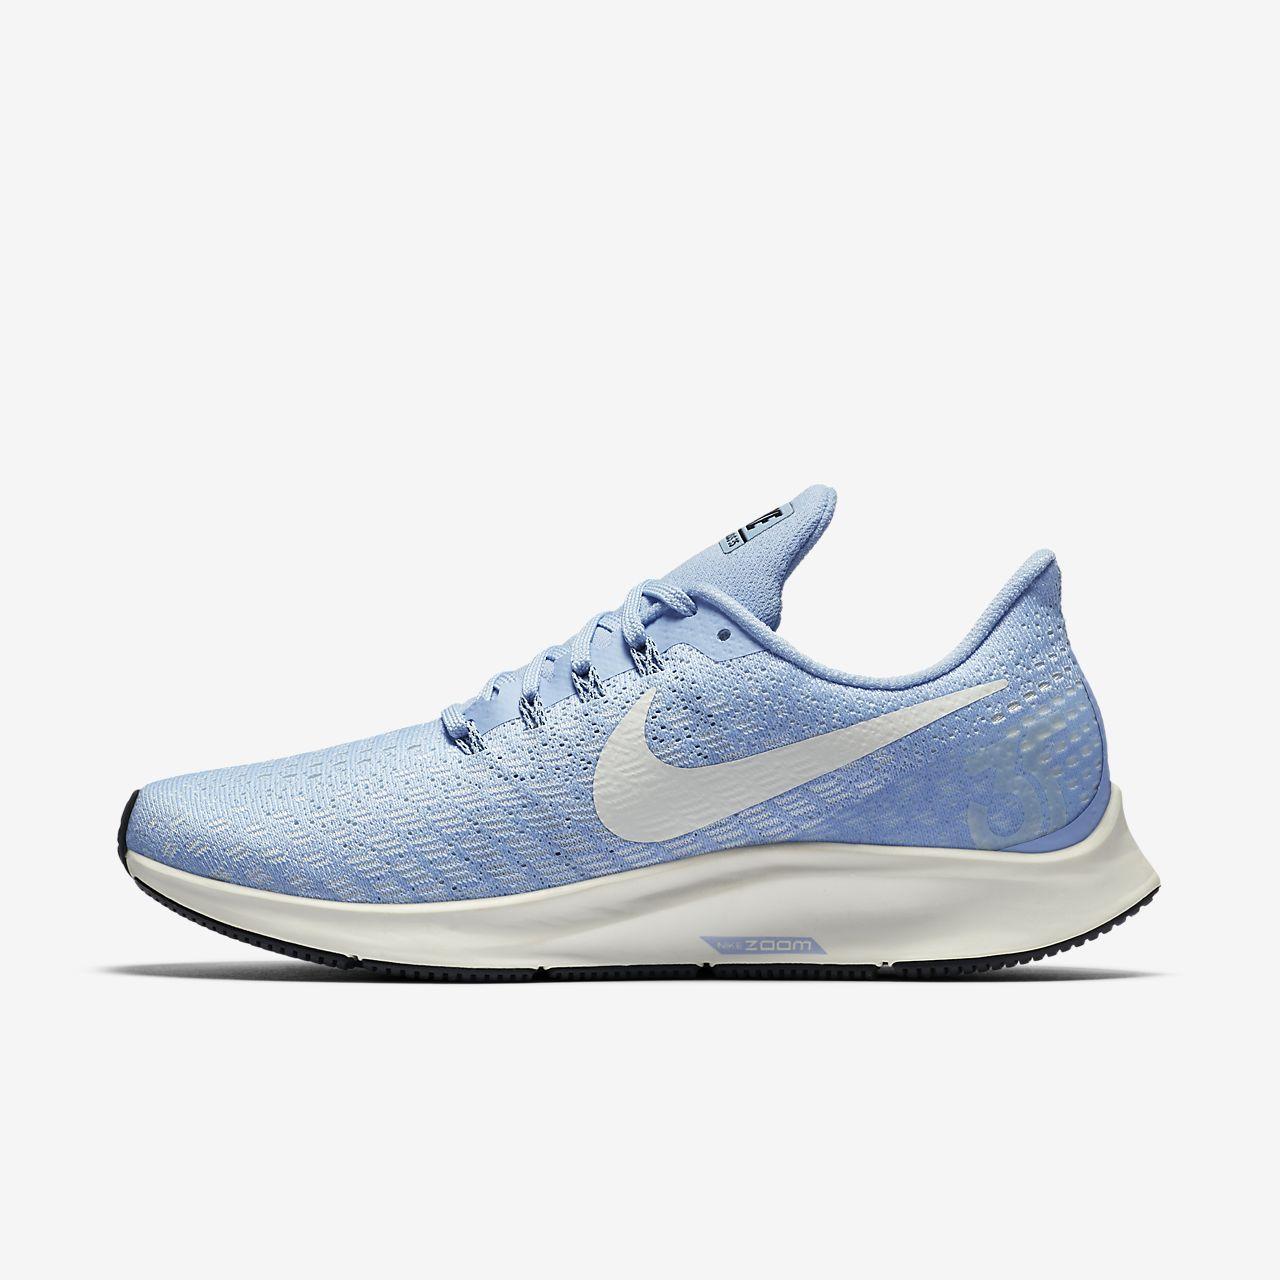 34d382c5da520 Nike Air Zoom Pegasus 35 Women s Running Shoe. Nike.com PT